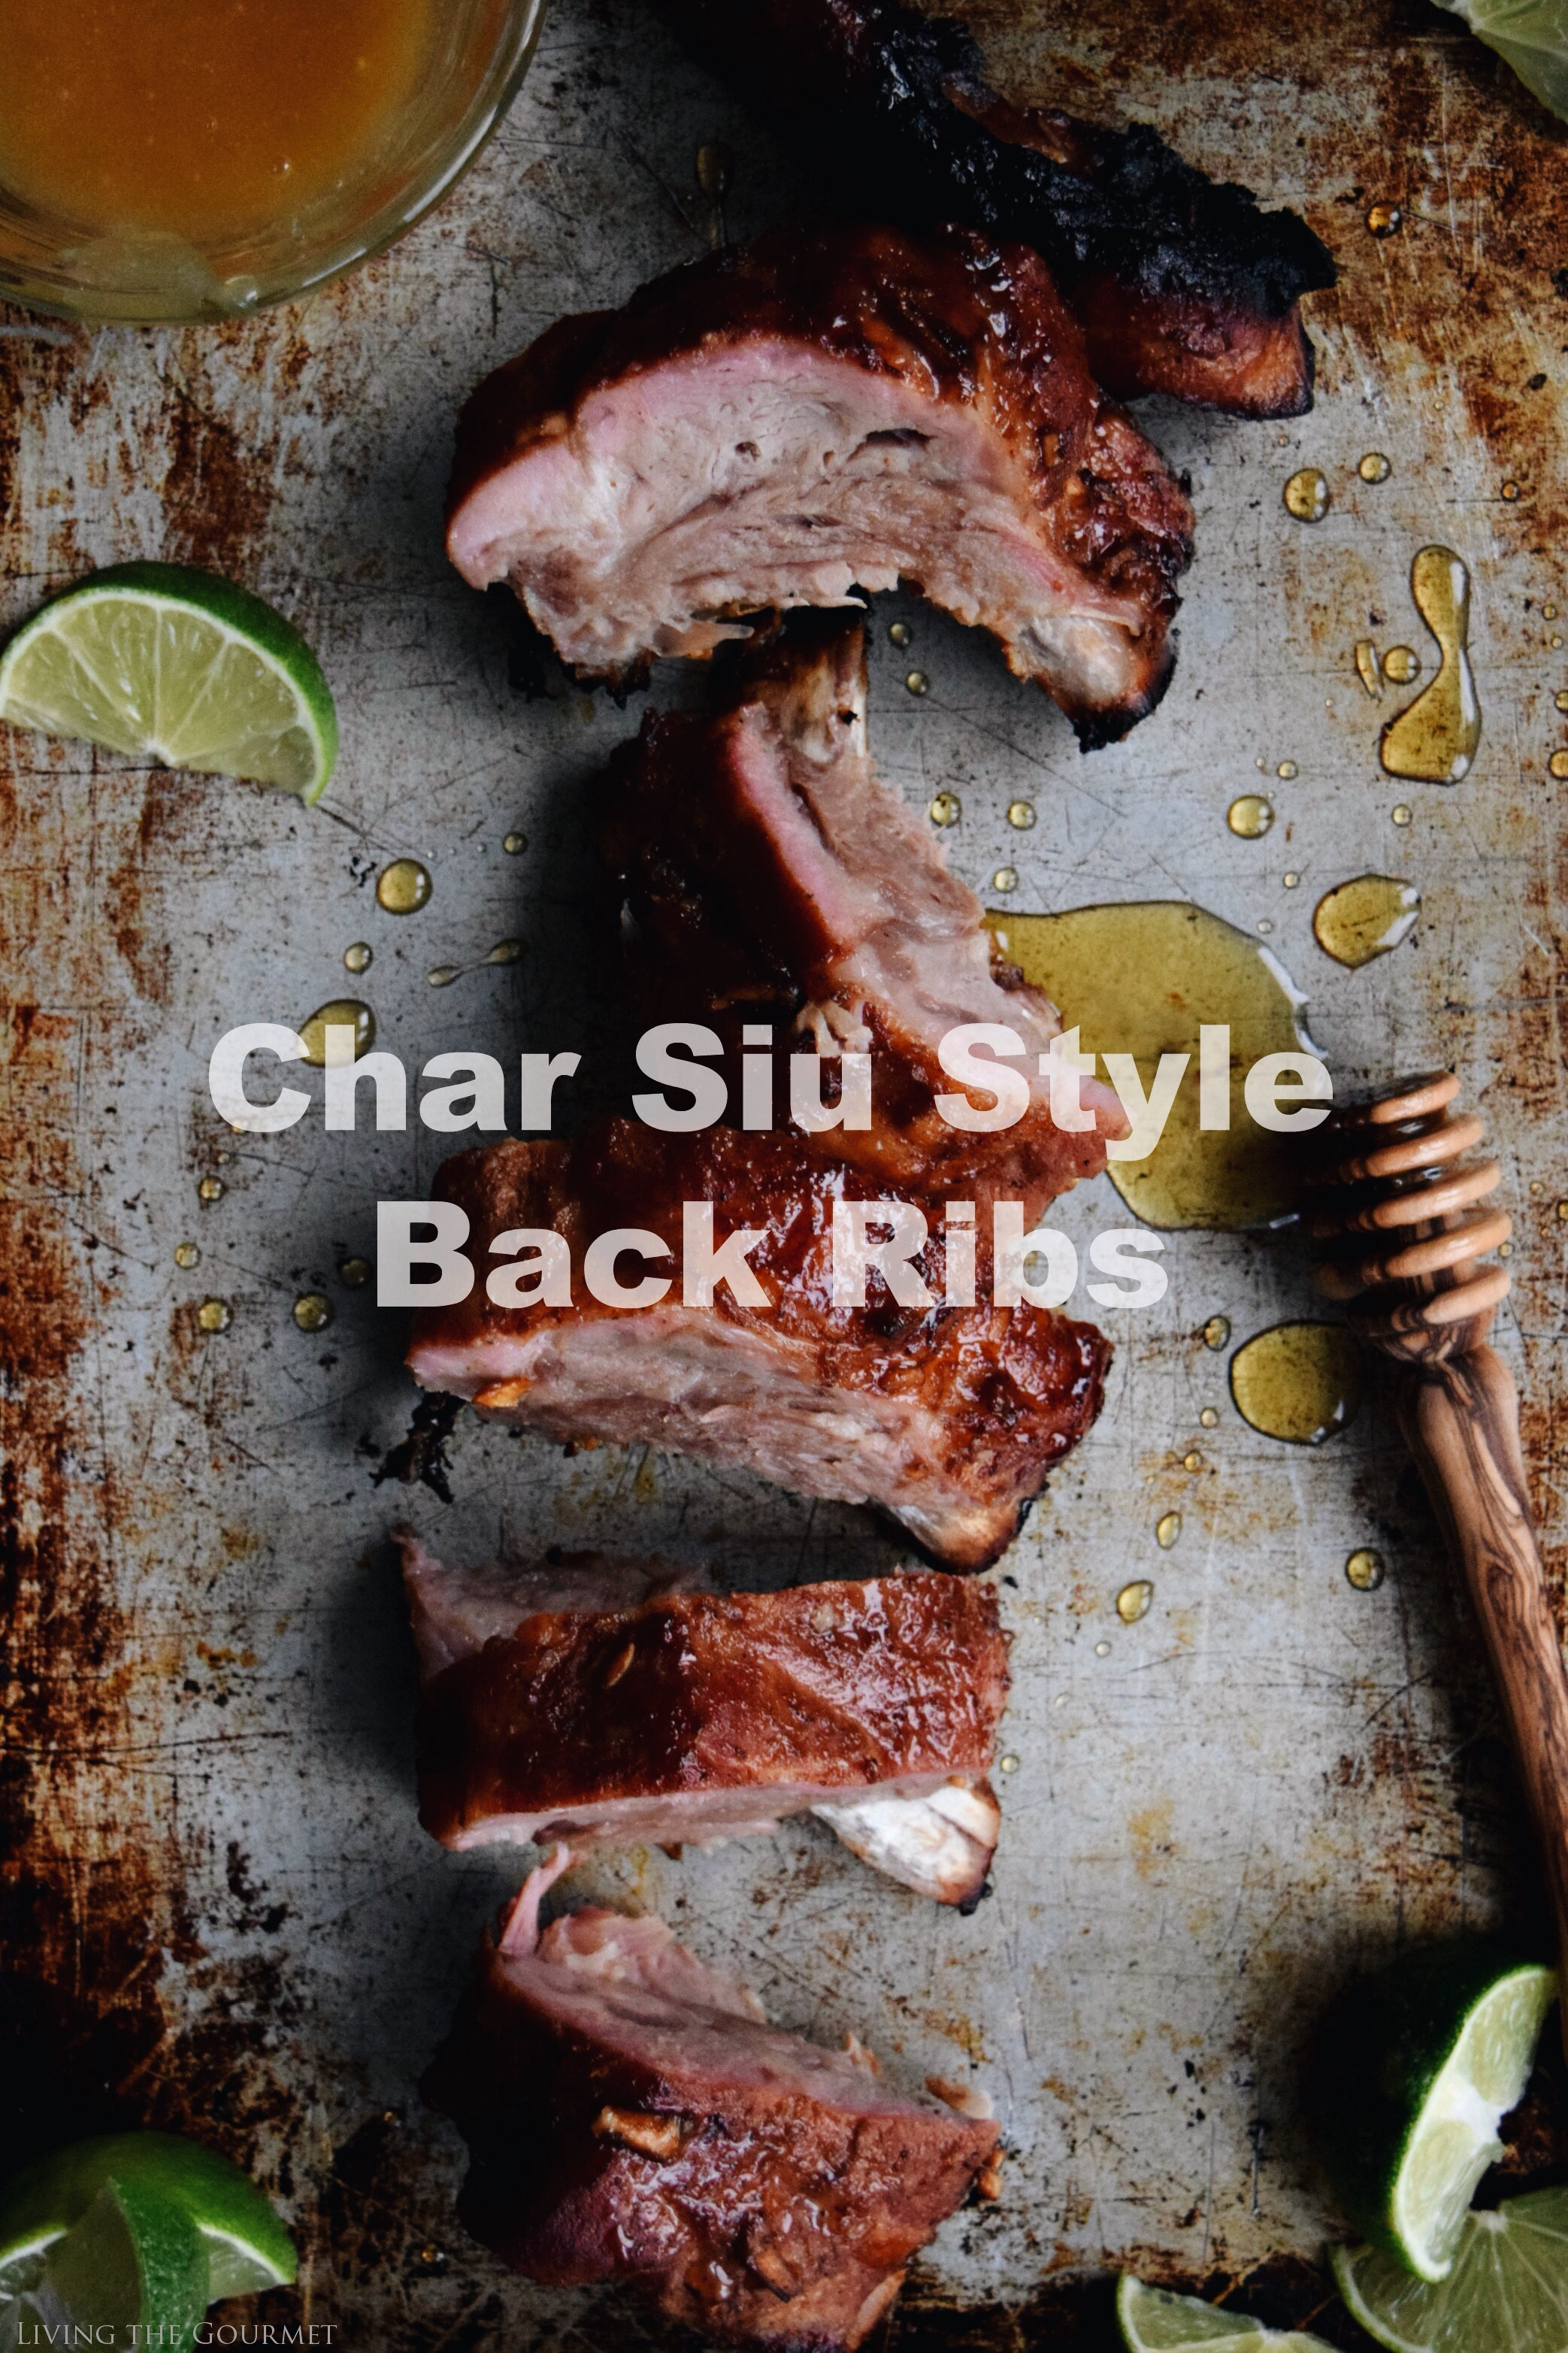 Living the Gourmet: Char Siu Style Back Ribs | #HogWildThrowdown #ad